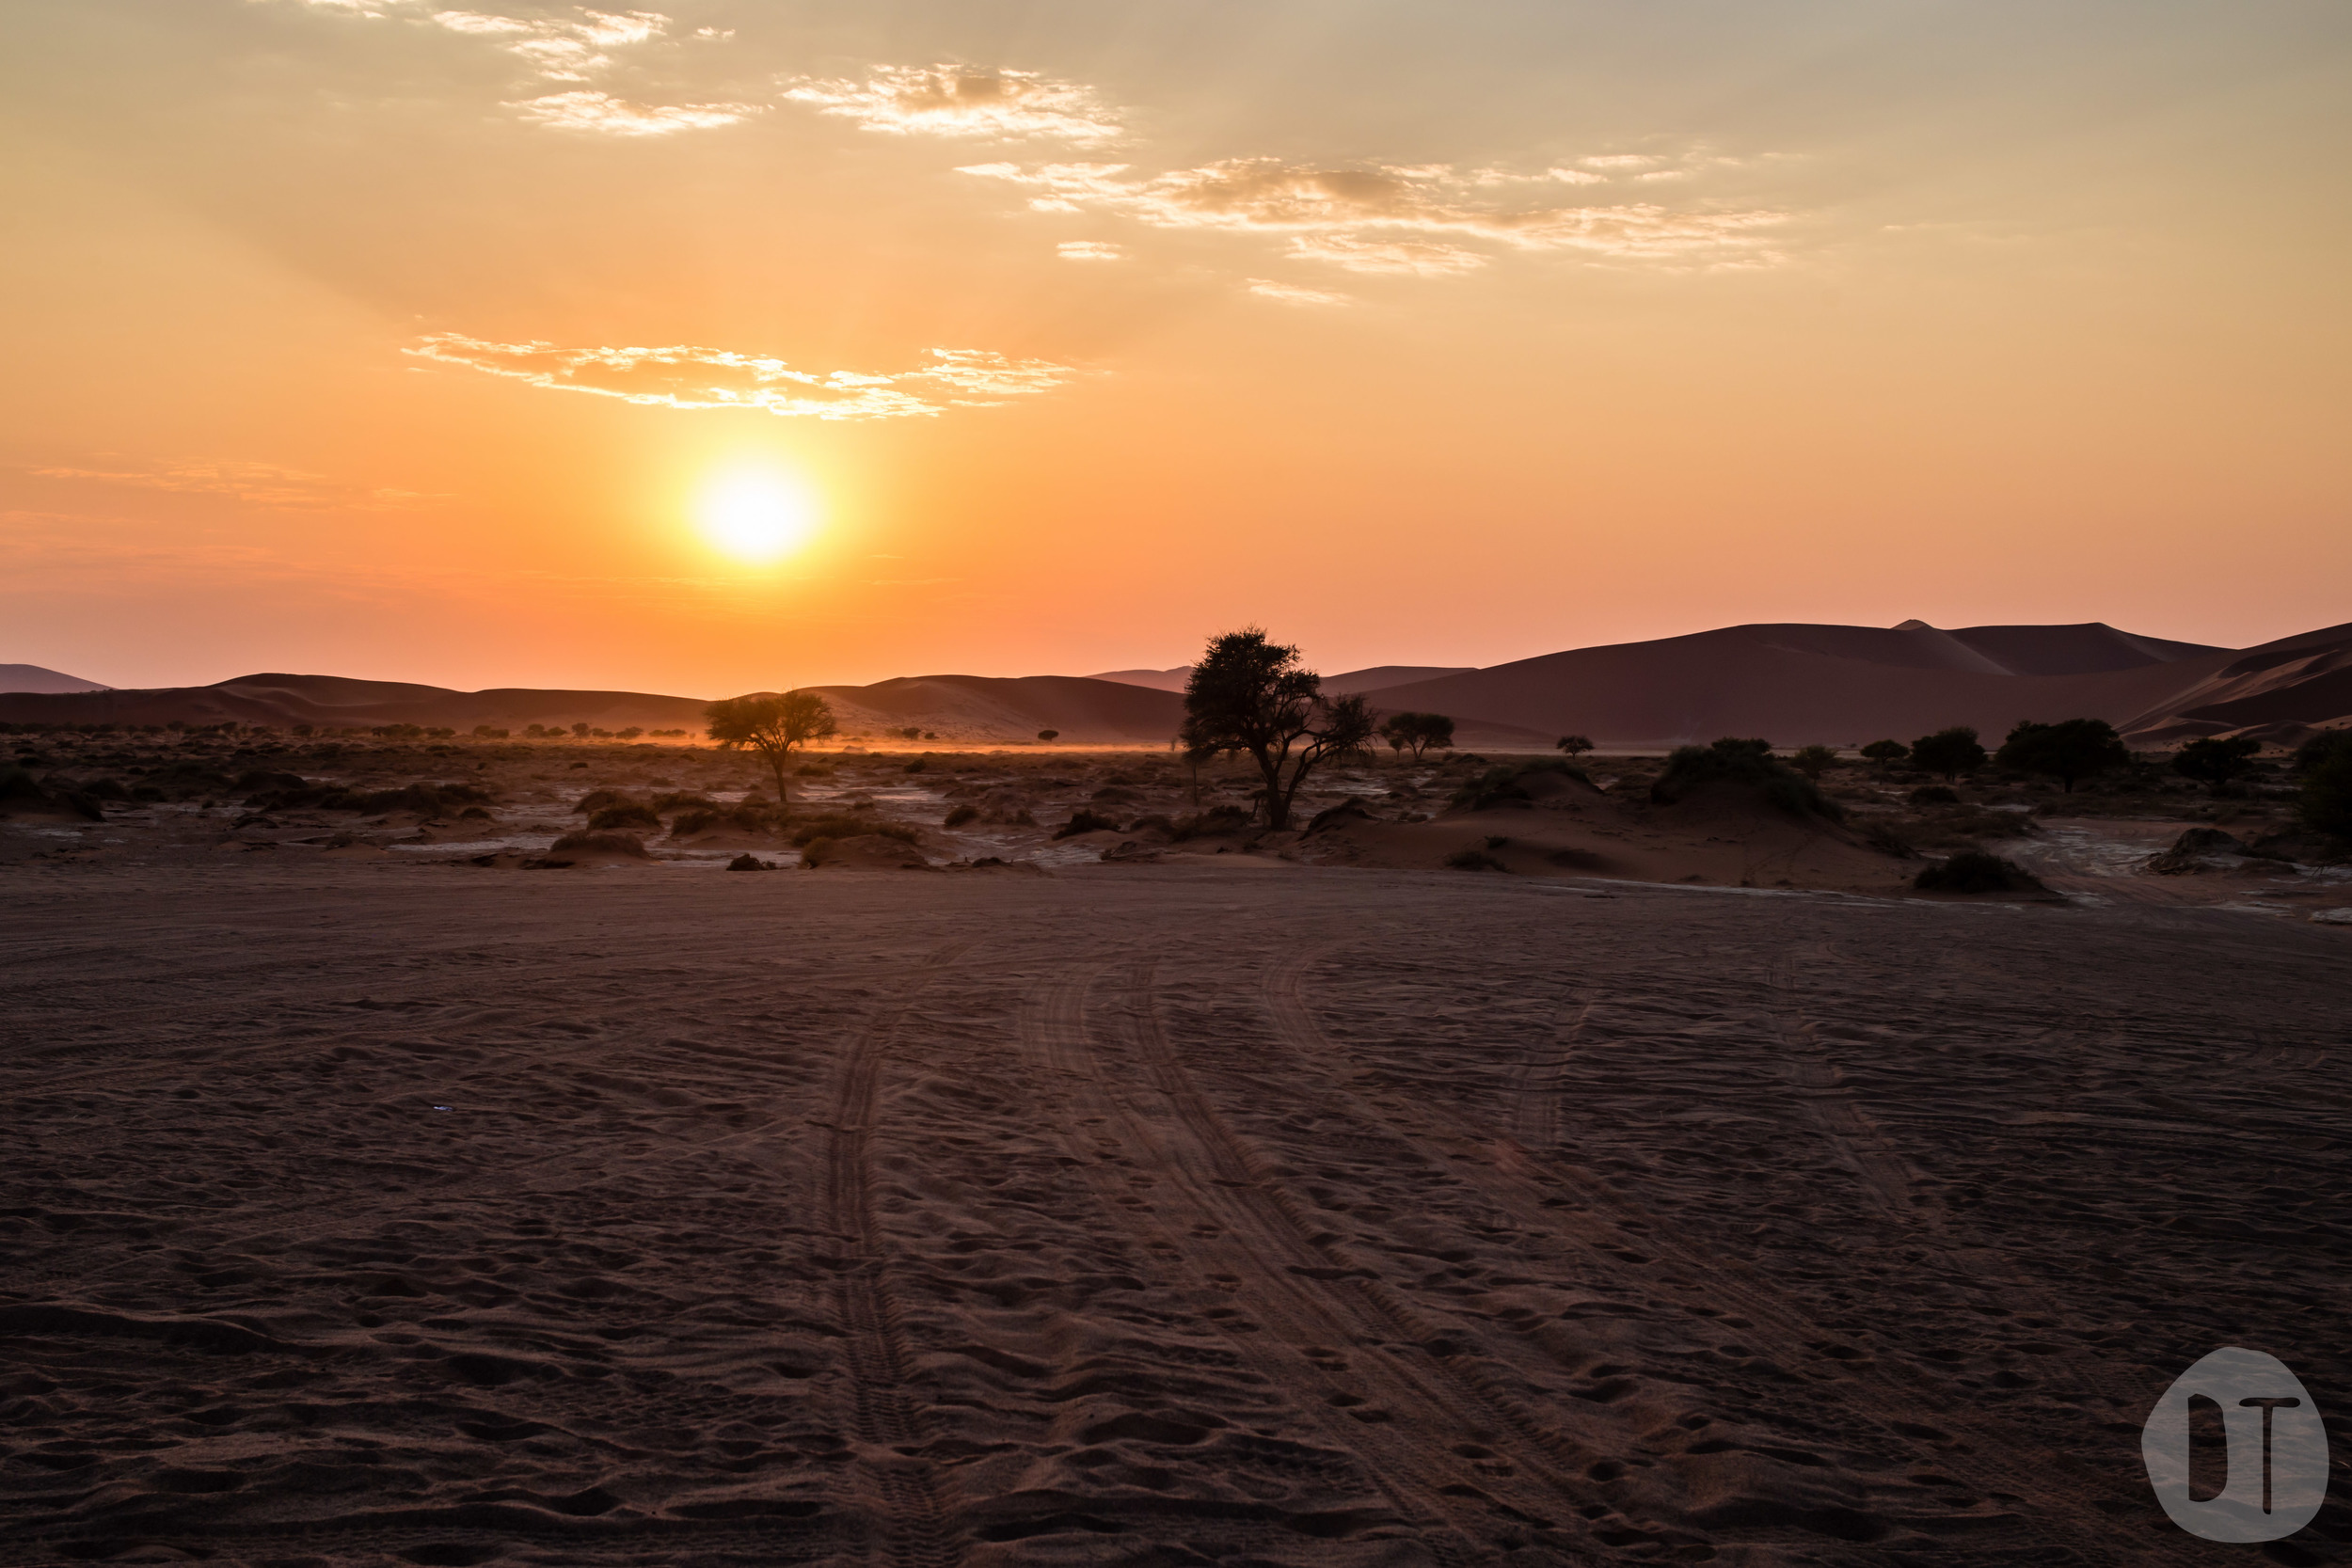 EARLY MORNING AT Sossusvlei, NAMIBIA